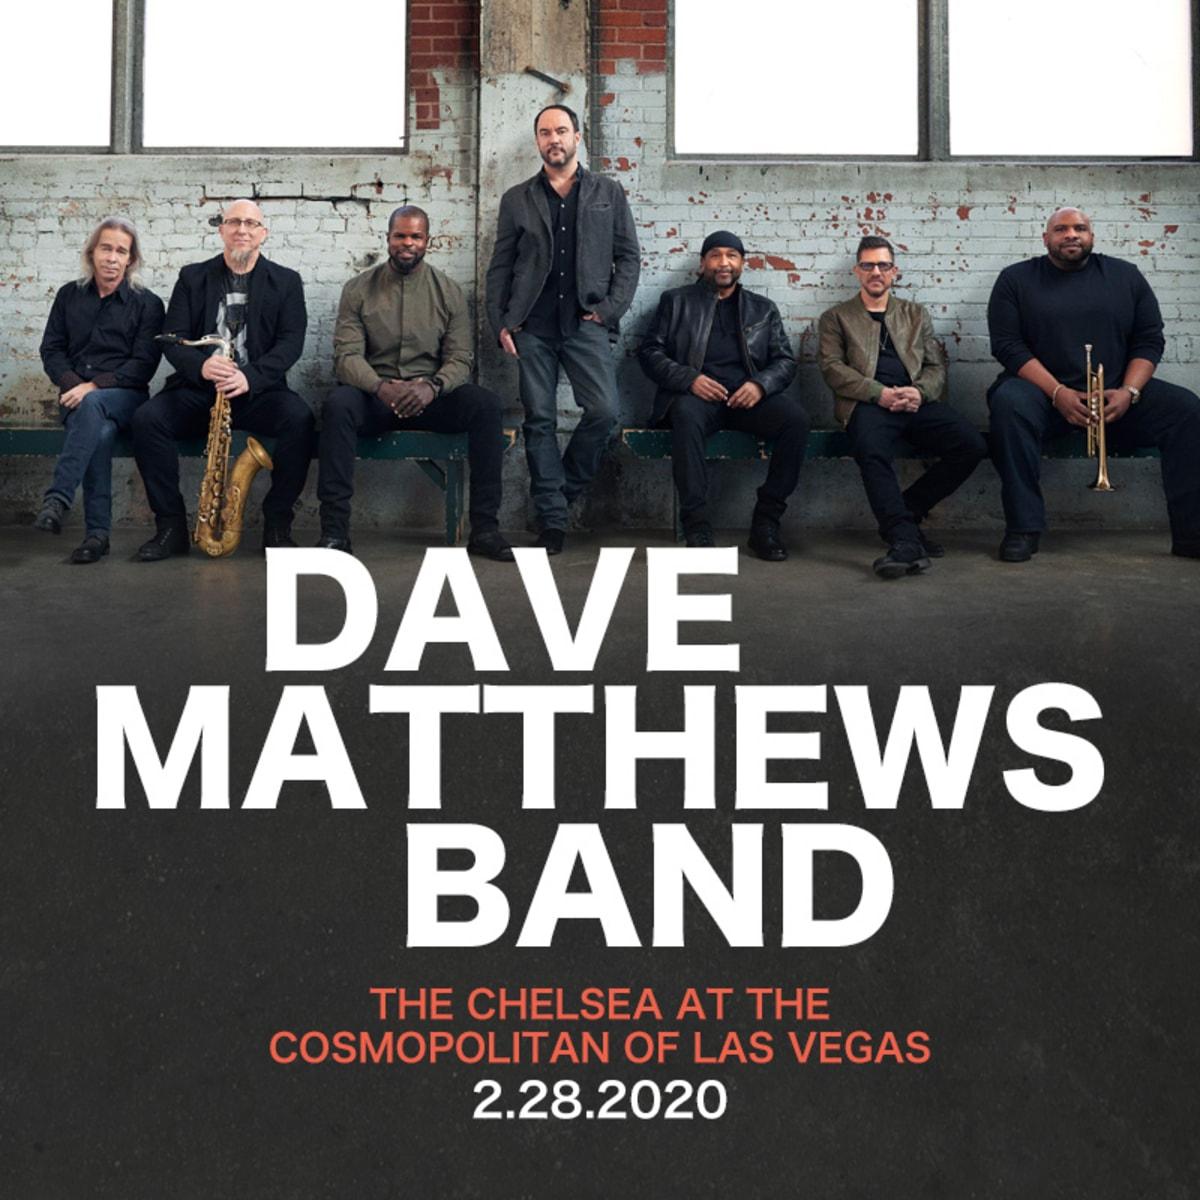 Dave Matthews Band Tour 2020.Dave Matthews Band Announces Las Vegas Concert